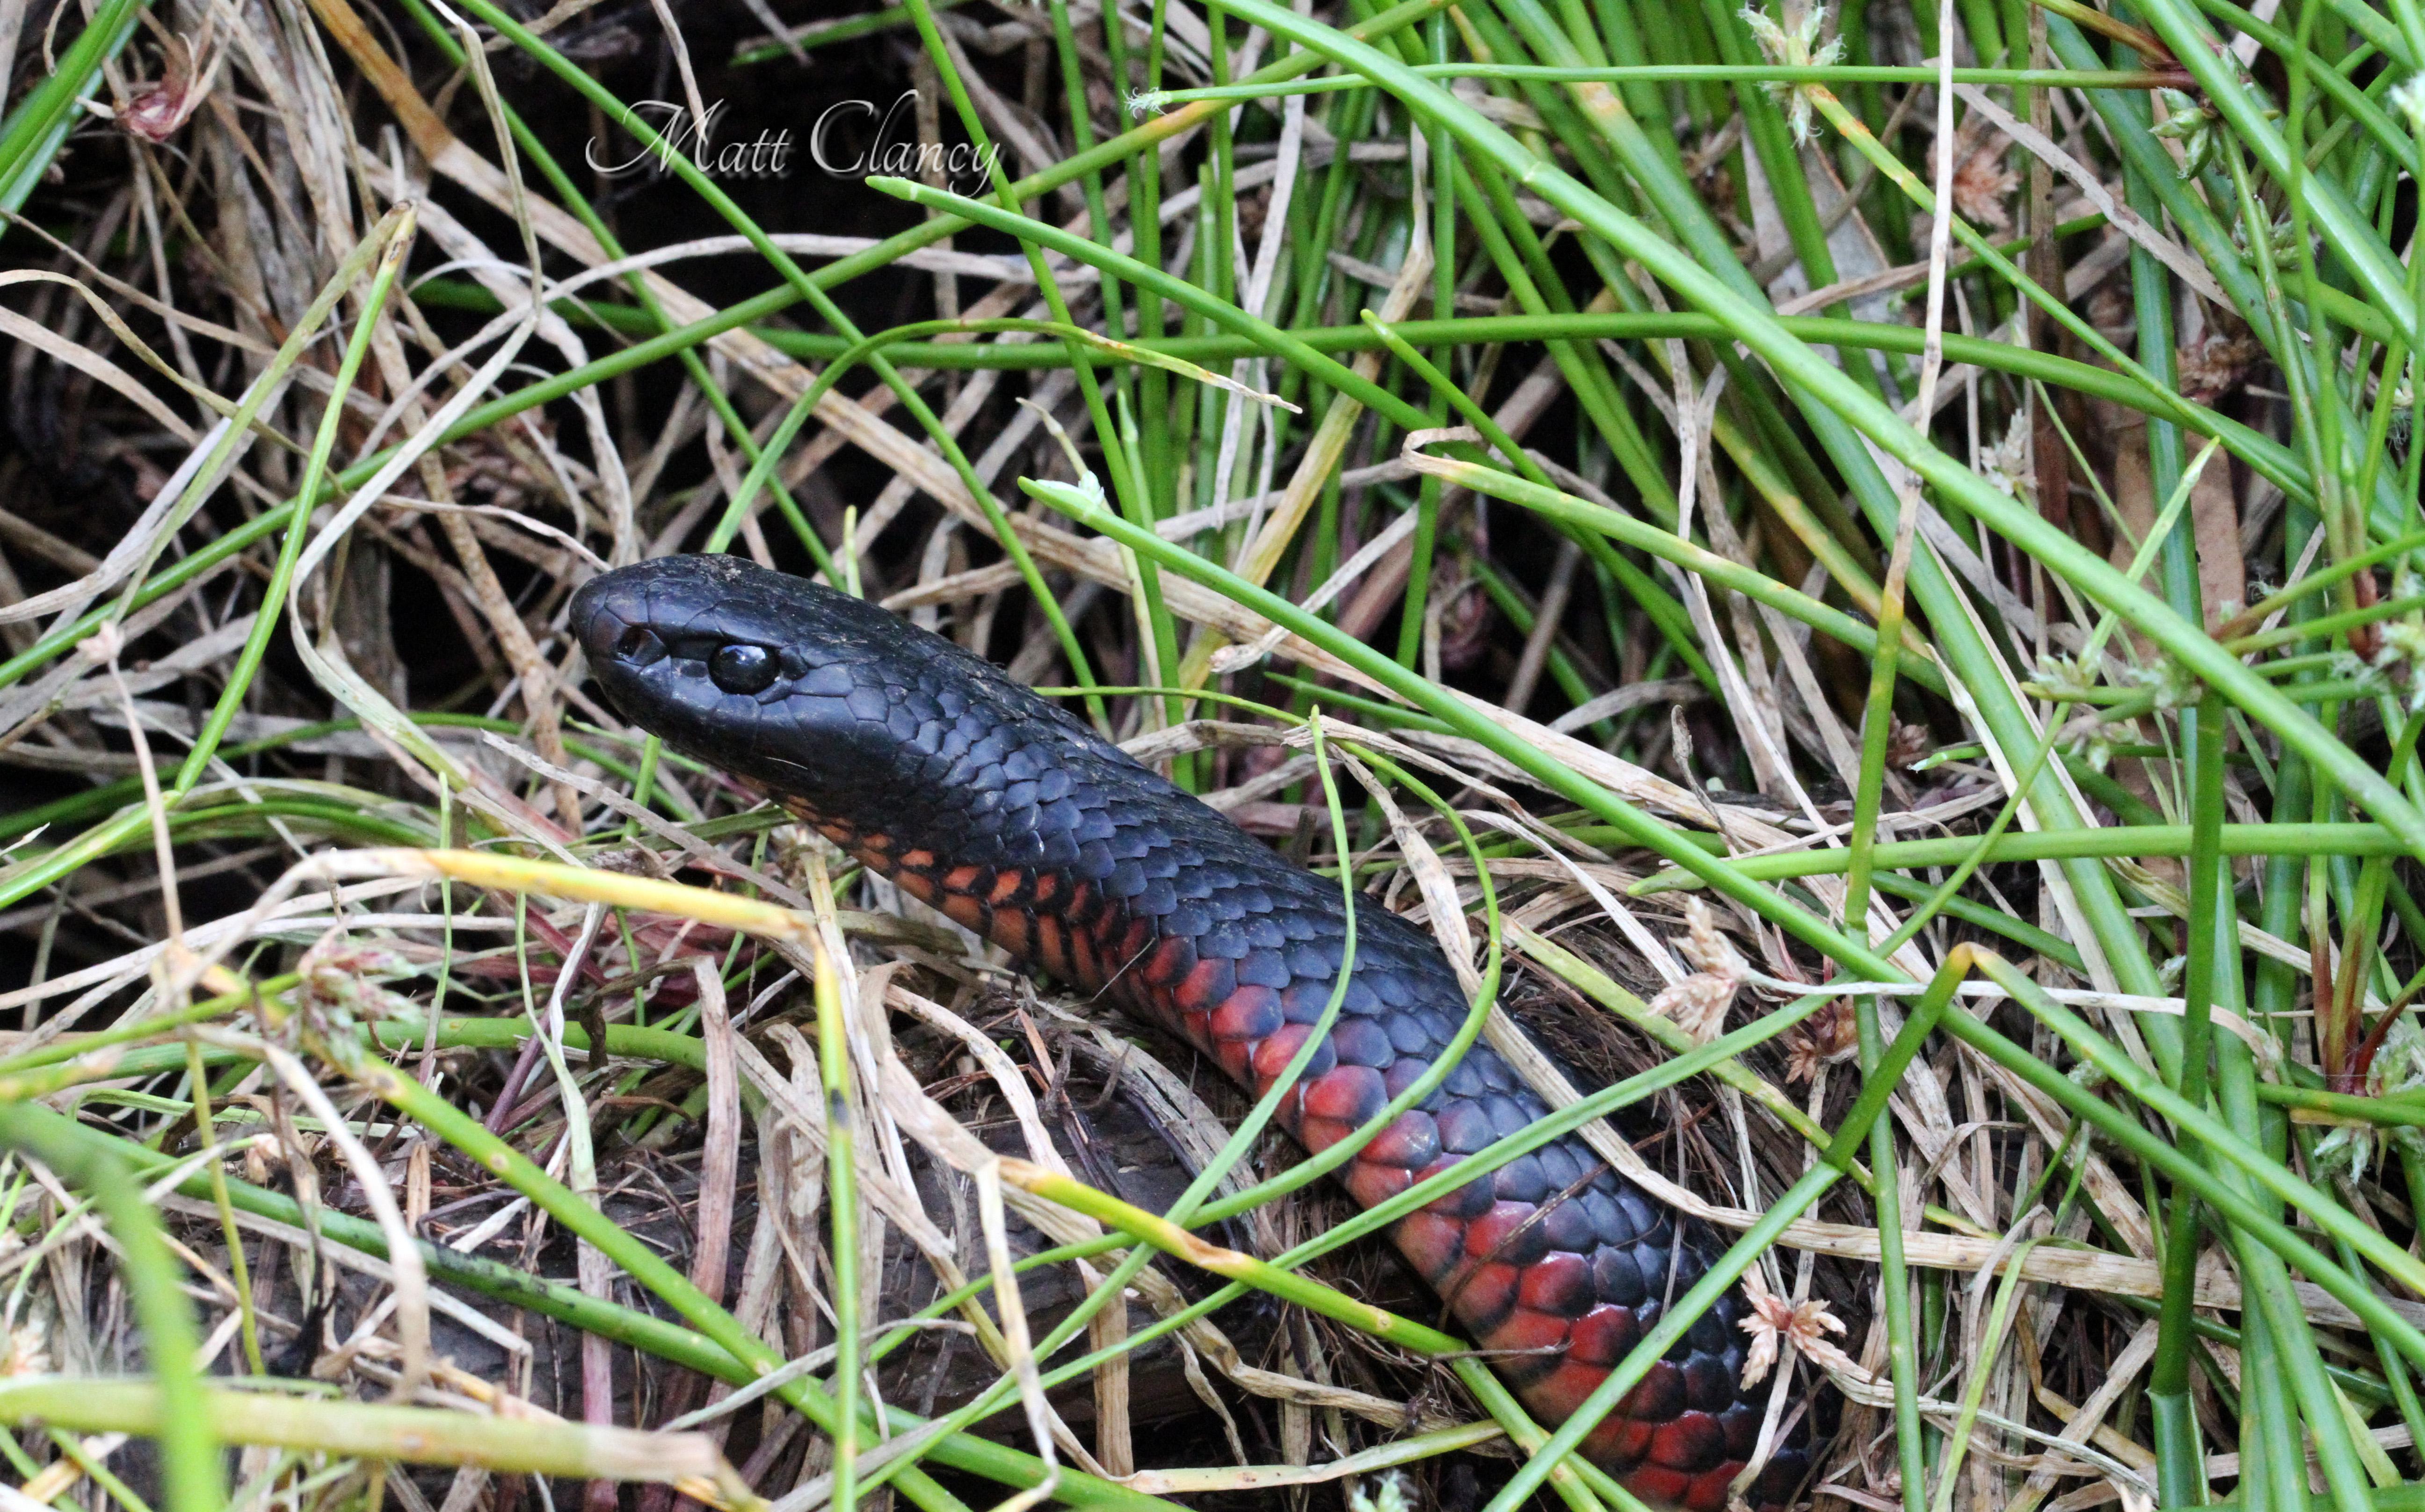 Red-bellied Black Snake svg #8, Download drawings